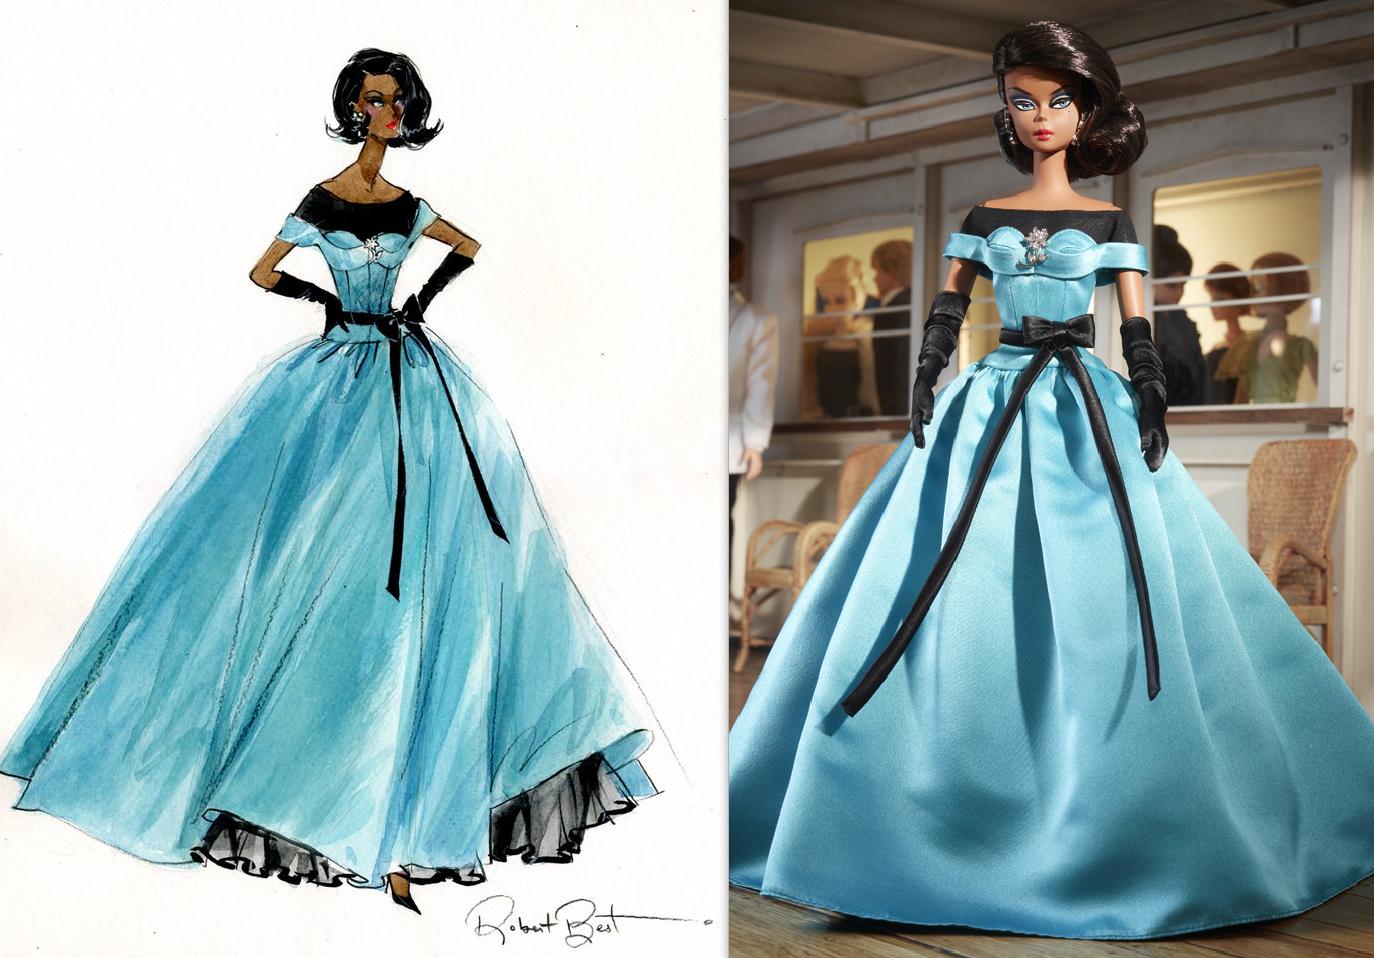 AA Ball Gown Sketch by Robert Best | Dutch Fashion Doll World